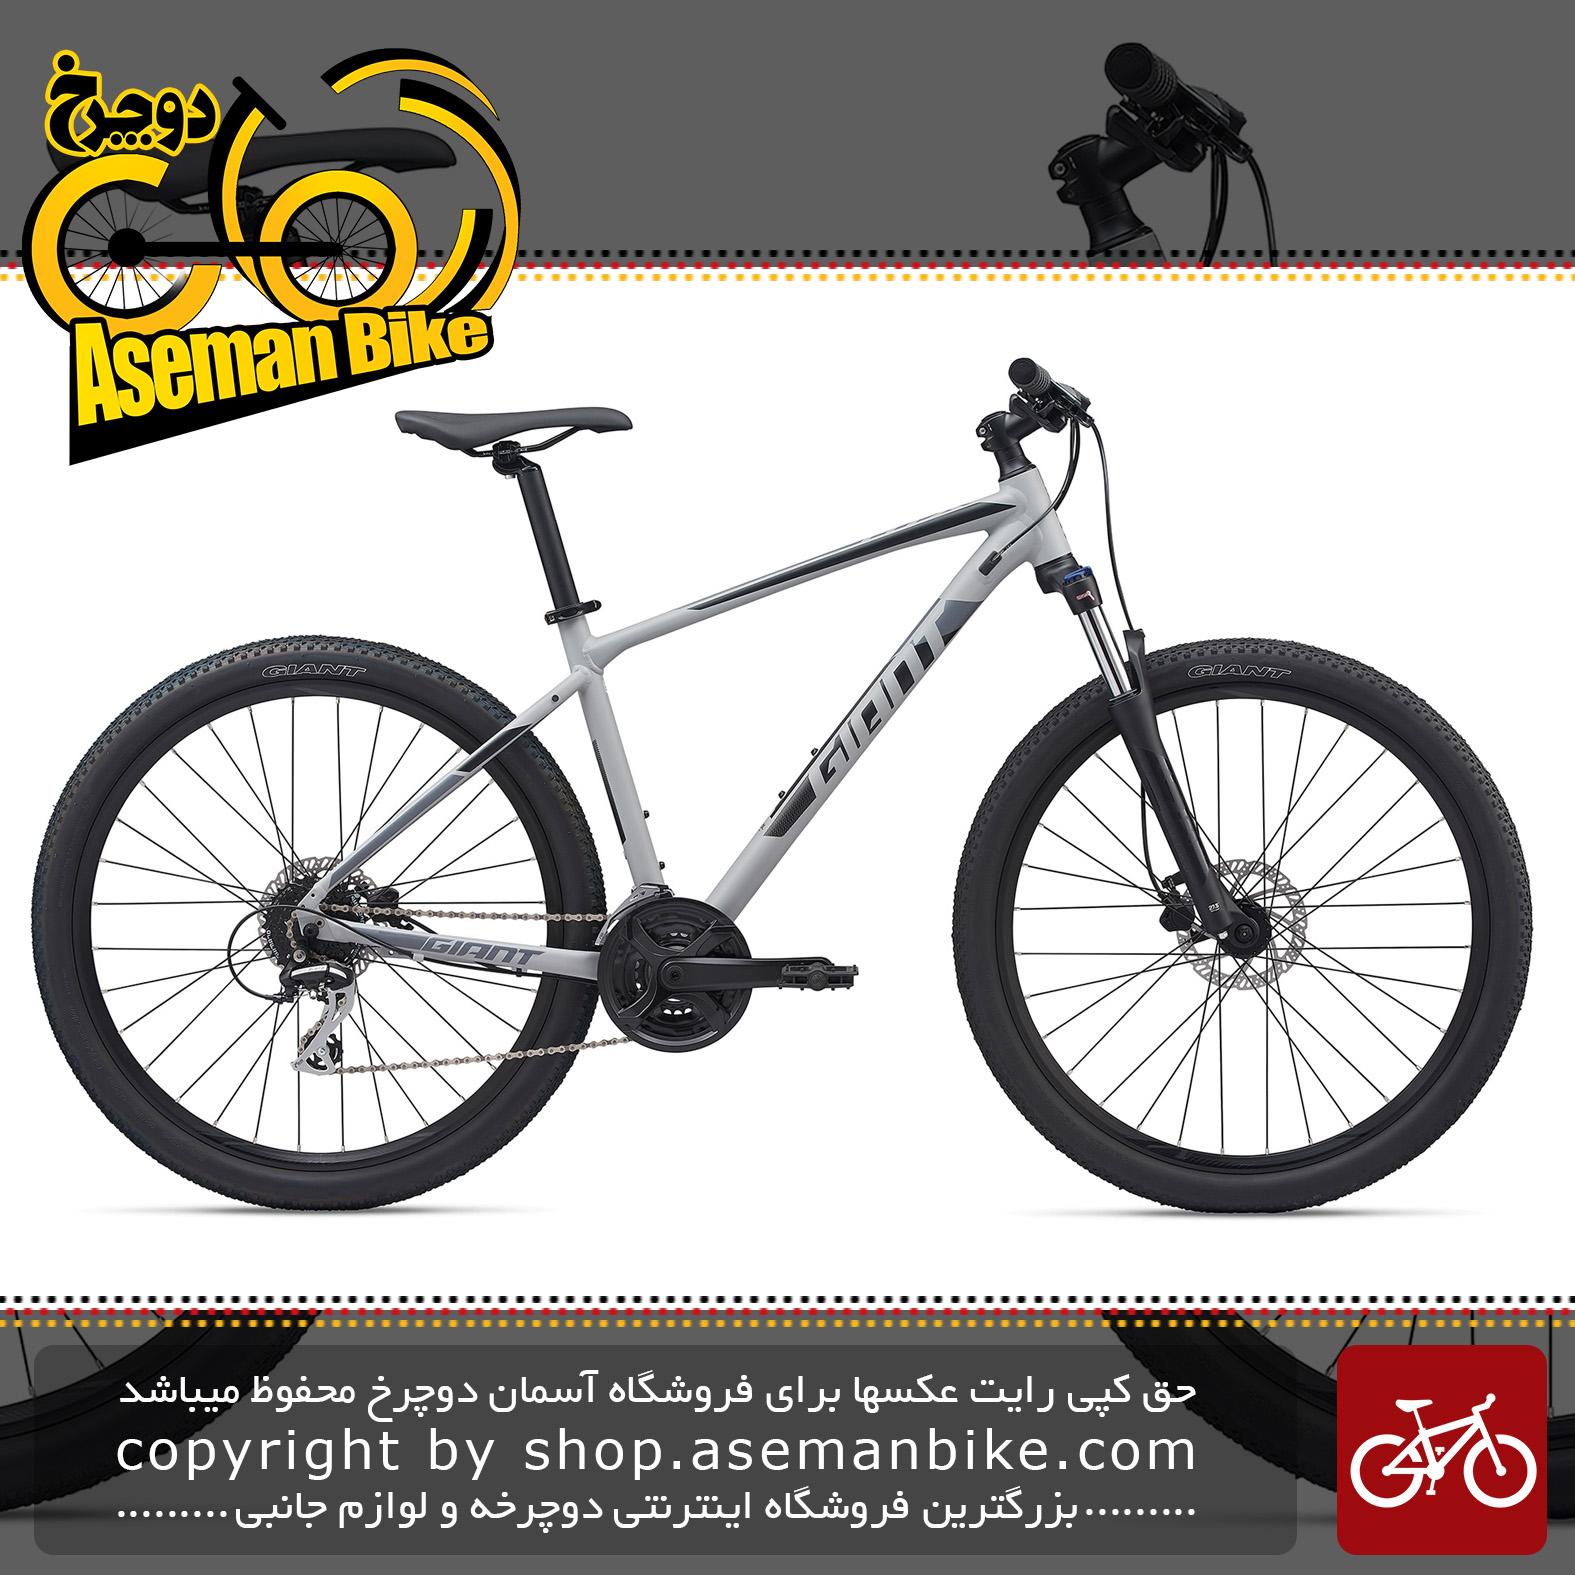 دوچرخه کوهستان جاینت مدل ای تی ایکس 1 2020 Giant Mountain Bicycle ATX 2 2020